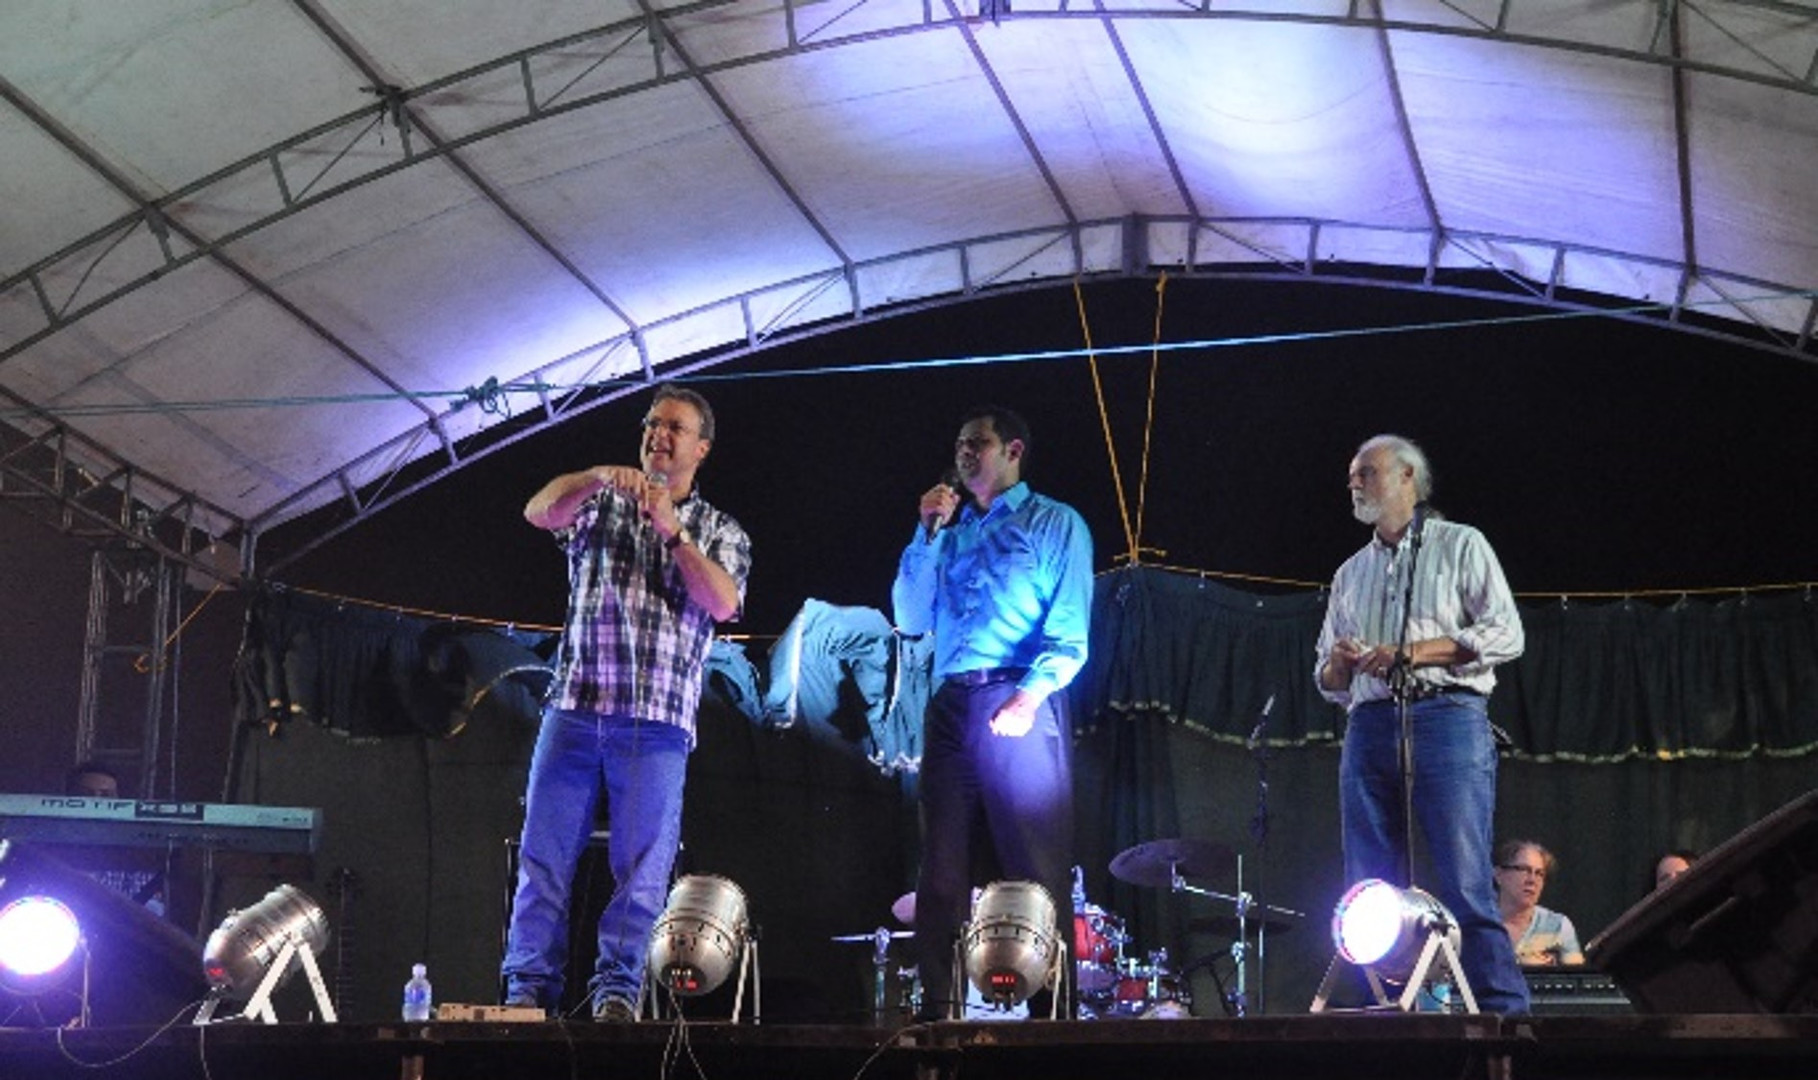 Bruce Van Natta, Oscar, and Bruce Carlson